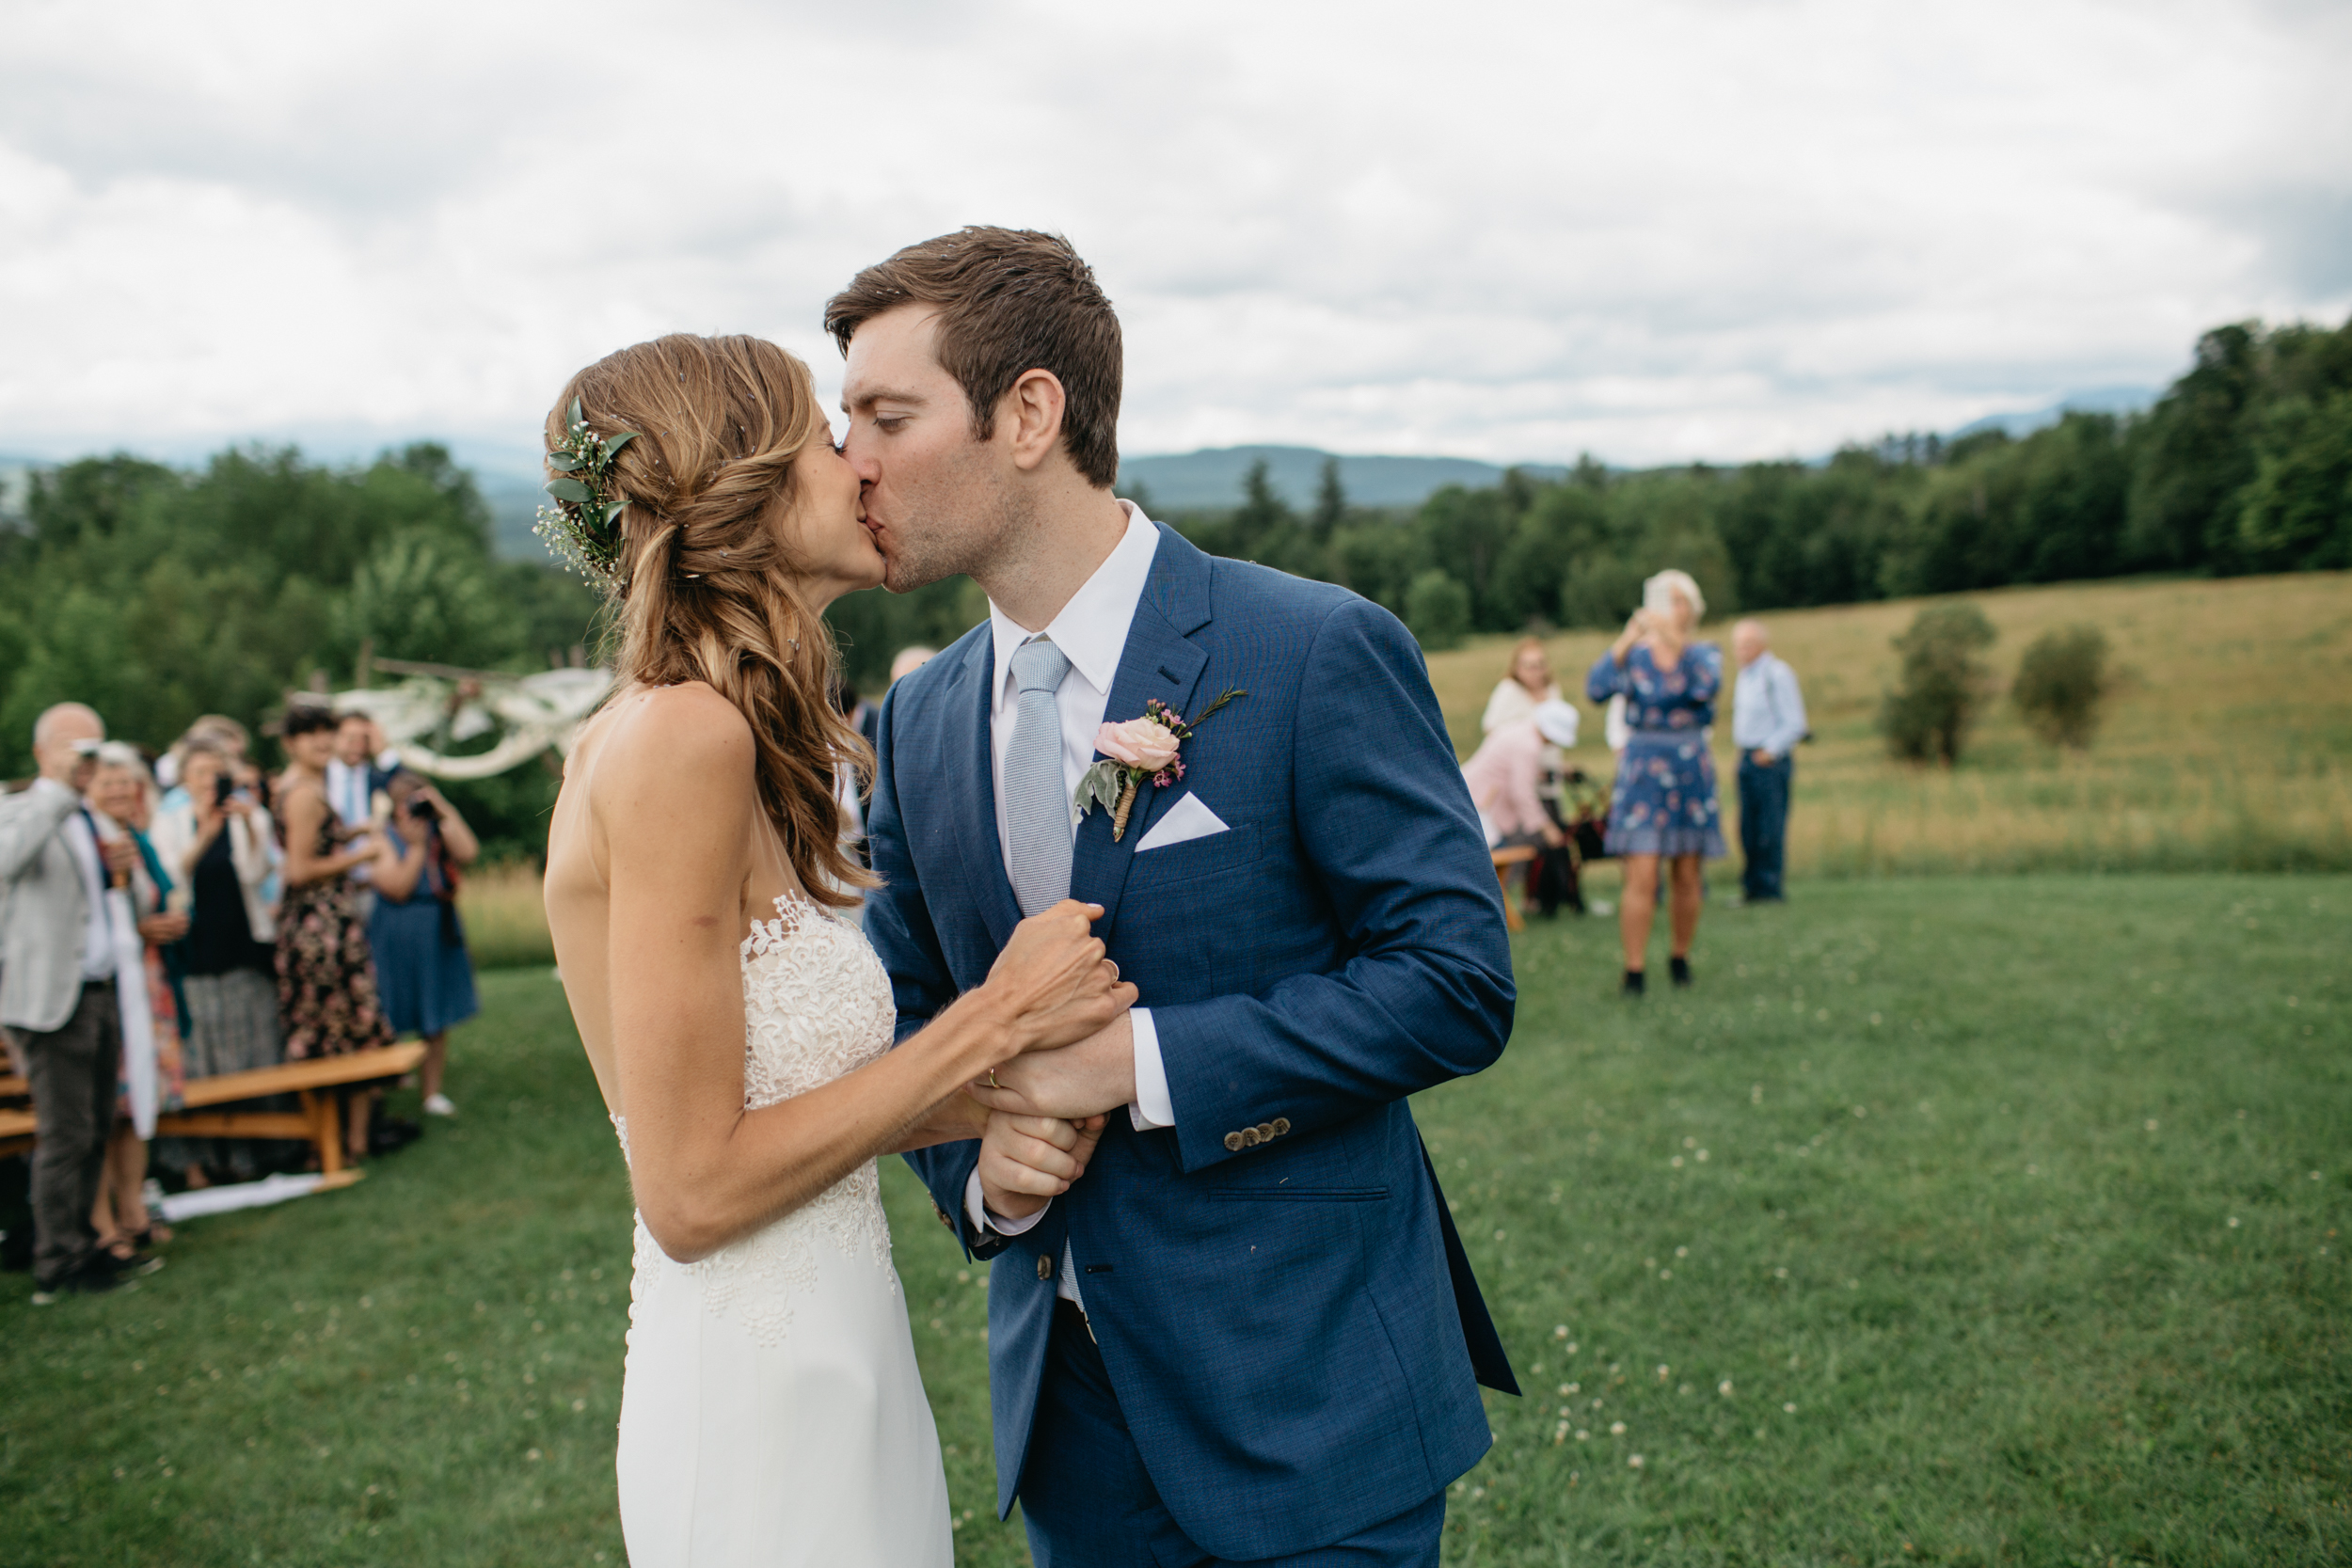 Karen_Alex_Bliss_ridge_farm_Vermont_wedding018.jpg